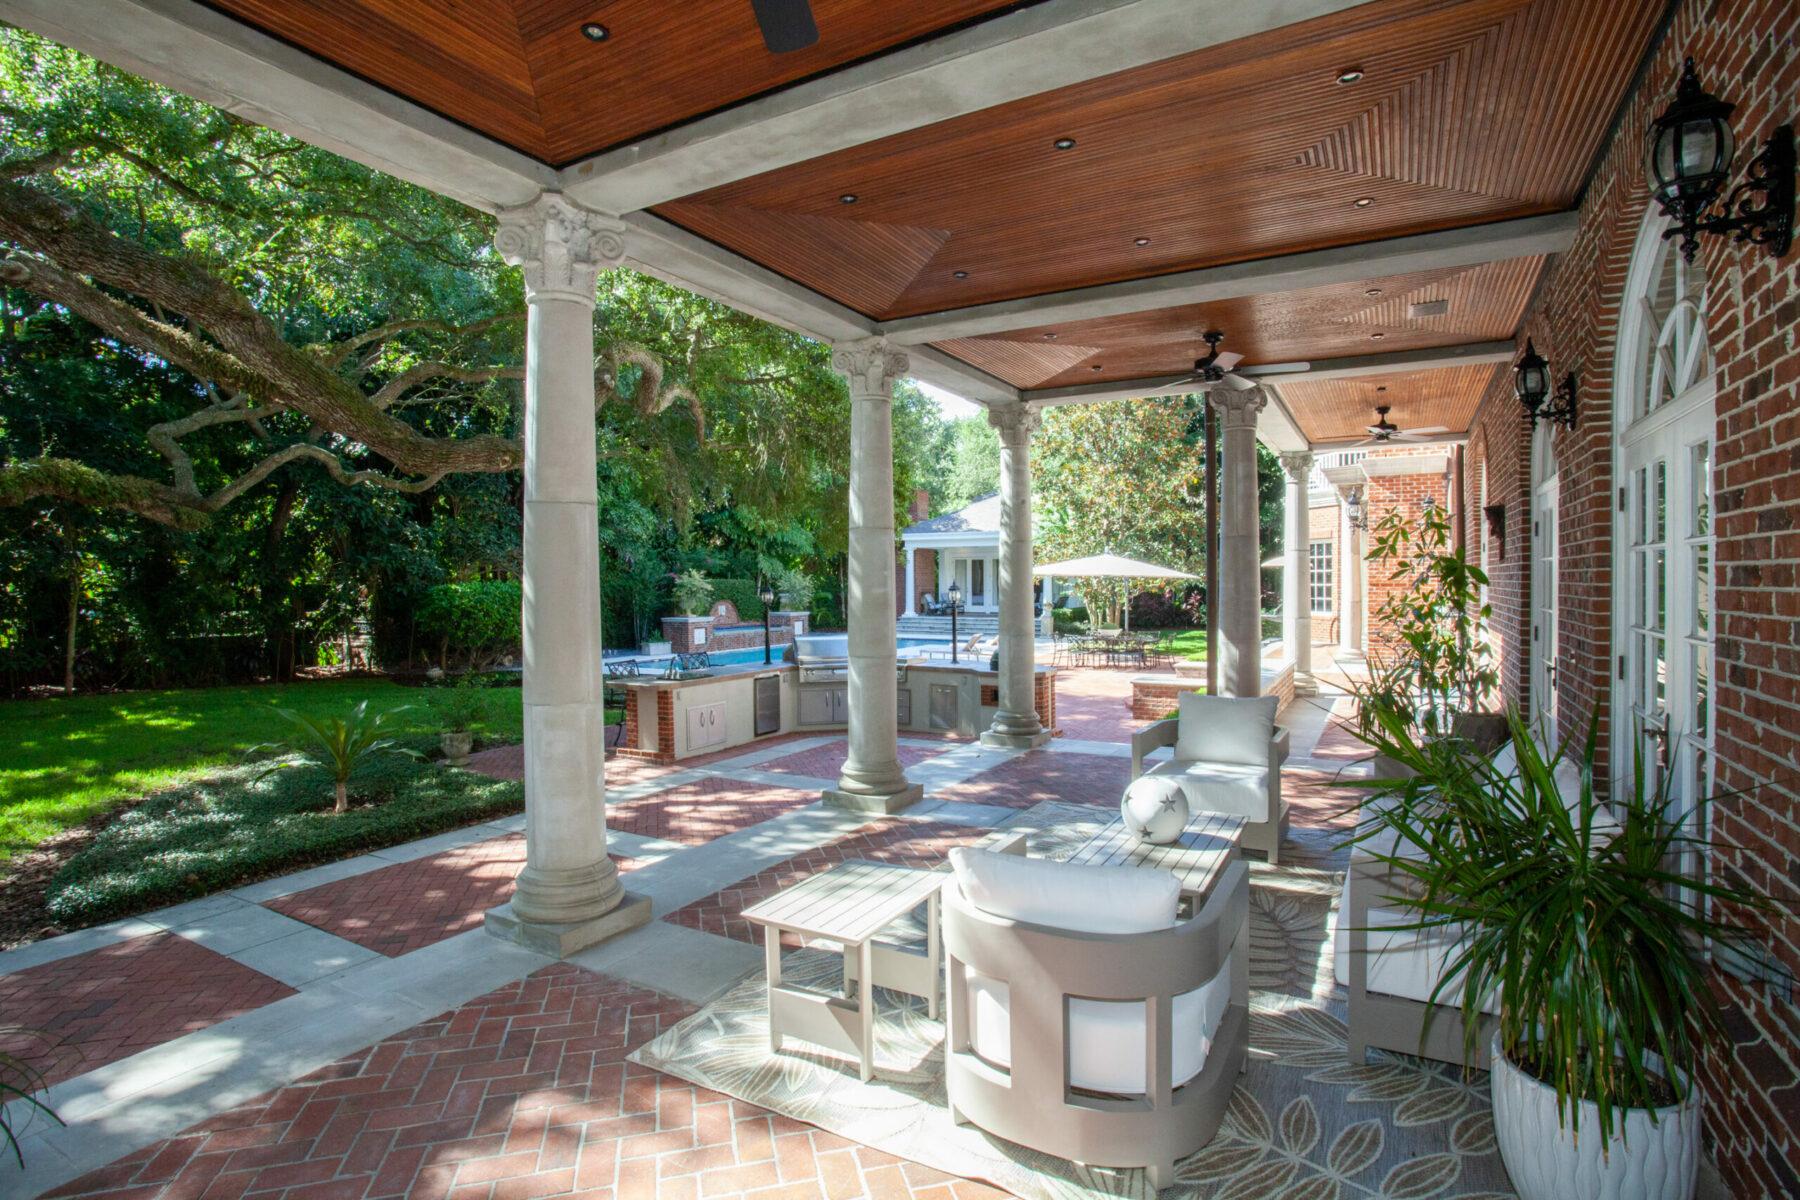 Tampa Florida, Modern interior design, Top interior designers Tampa, Home decorators Tampa, High-end interiors Tampa, Residential home designer